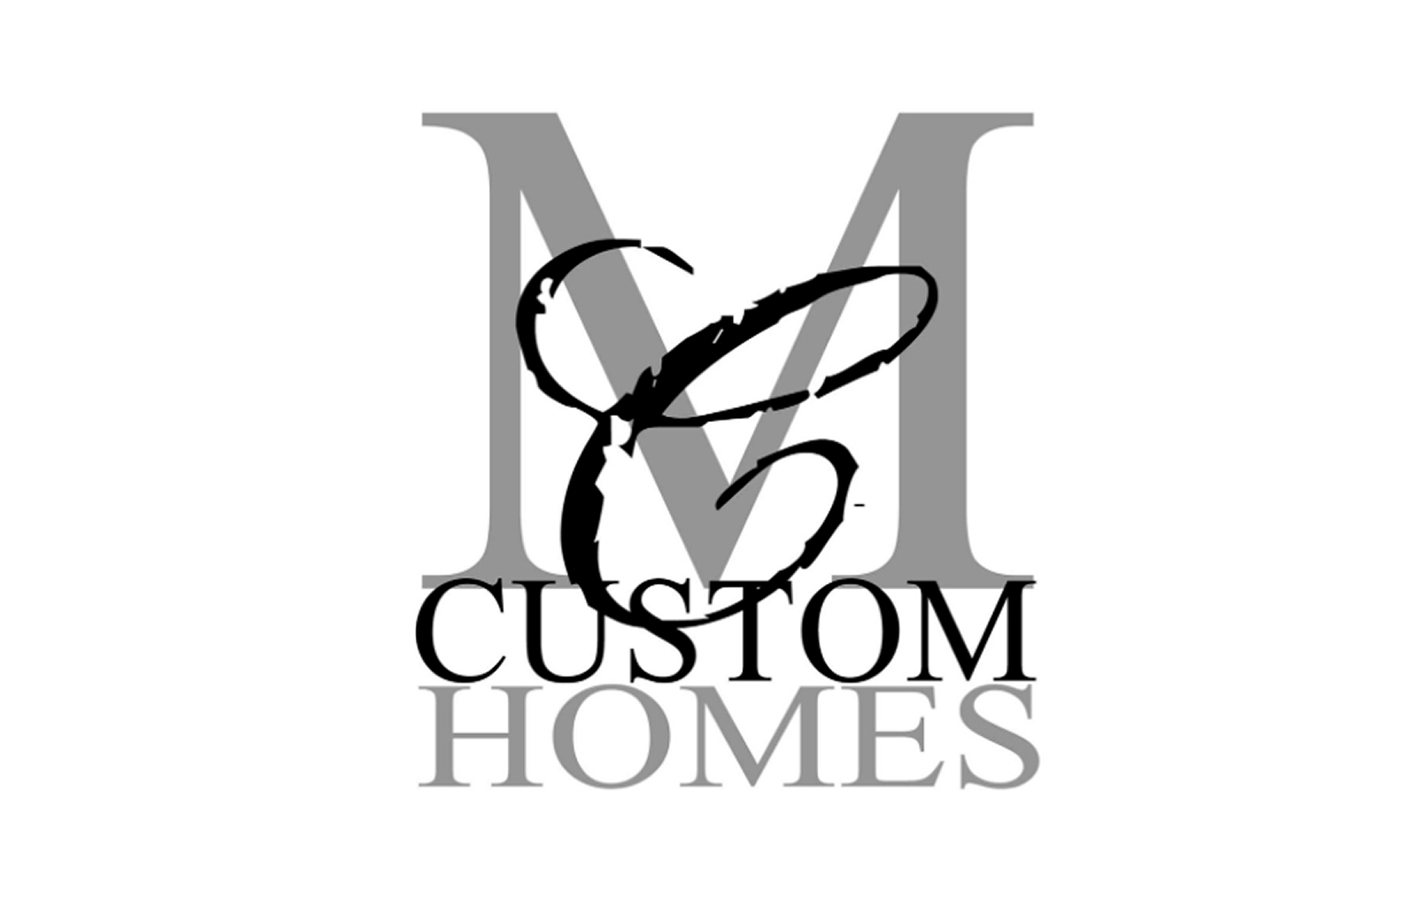 Client: MC Custom Homes